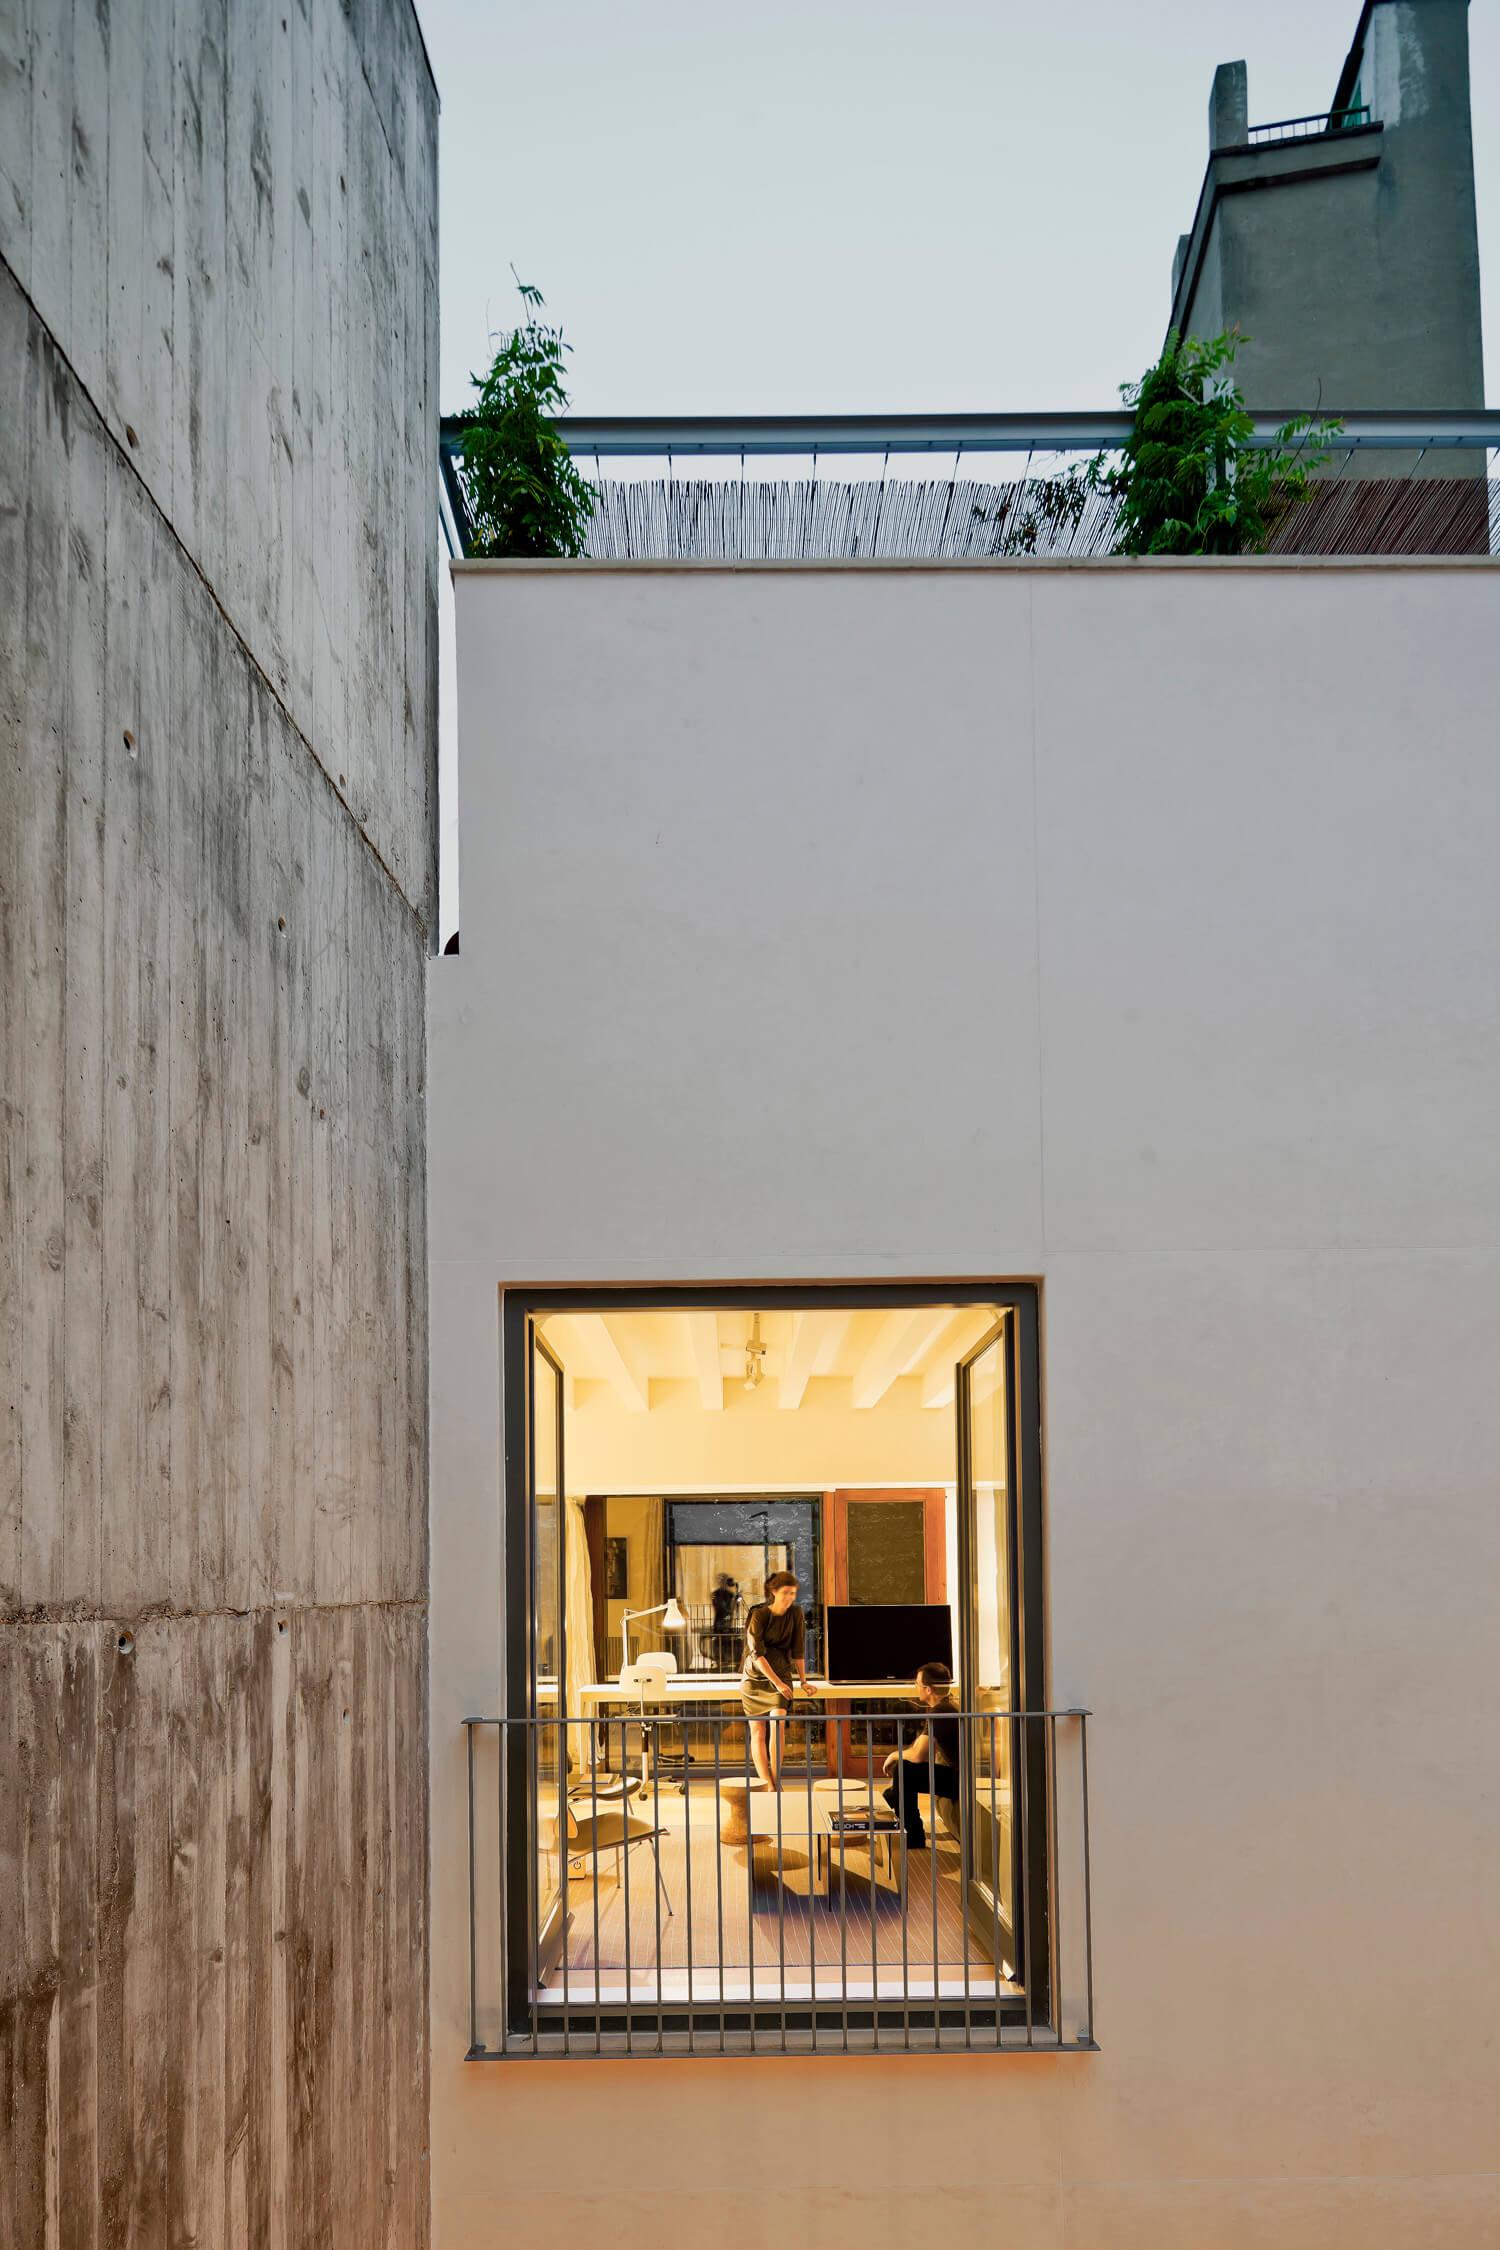 planell-hirsch_arquitectura_rehabilitacion_interiorismo_barcelona_born_mirallers_exterior-patio_adriagoula_2087